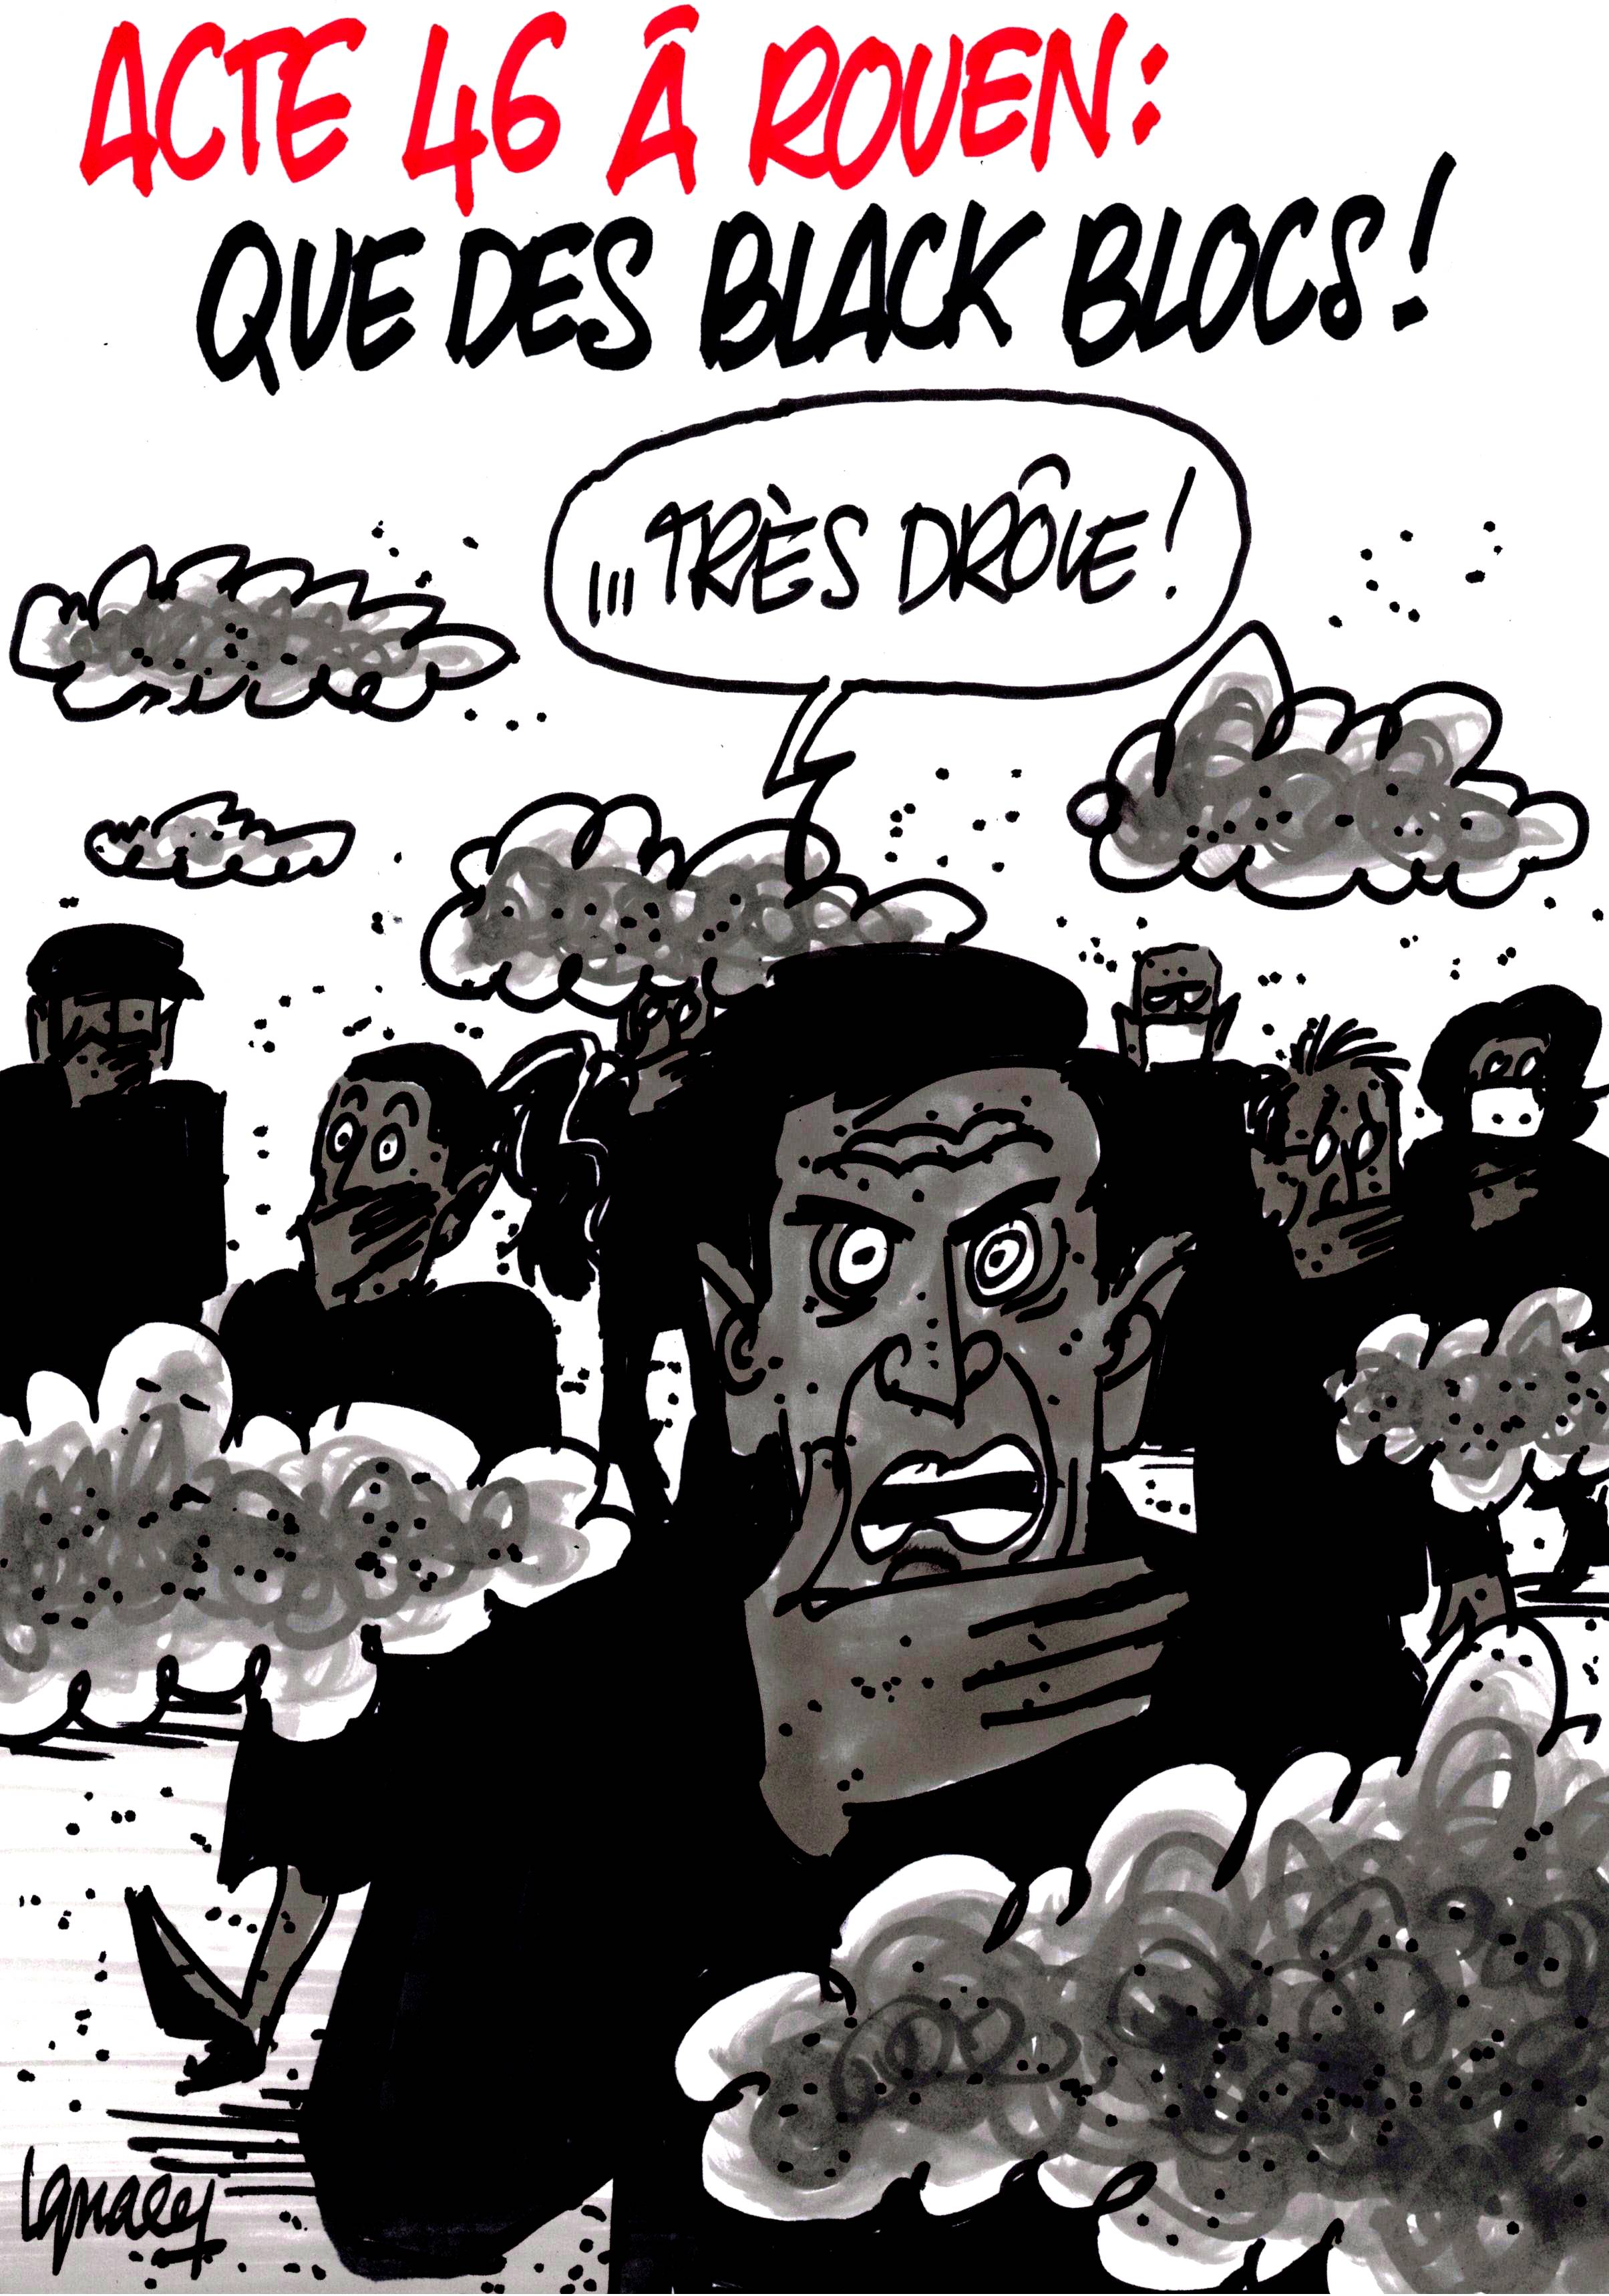 Ignace - Acte 46 à Rouen